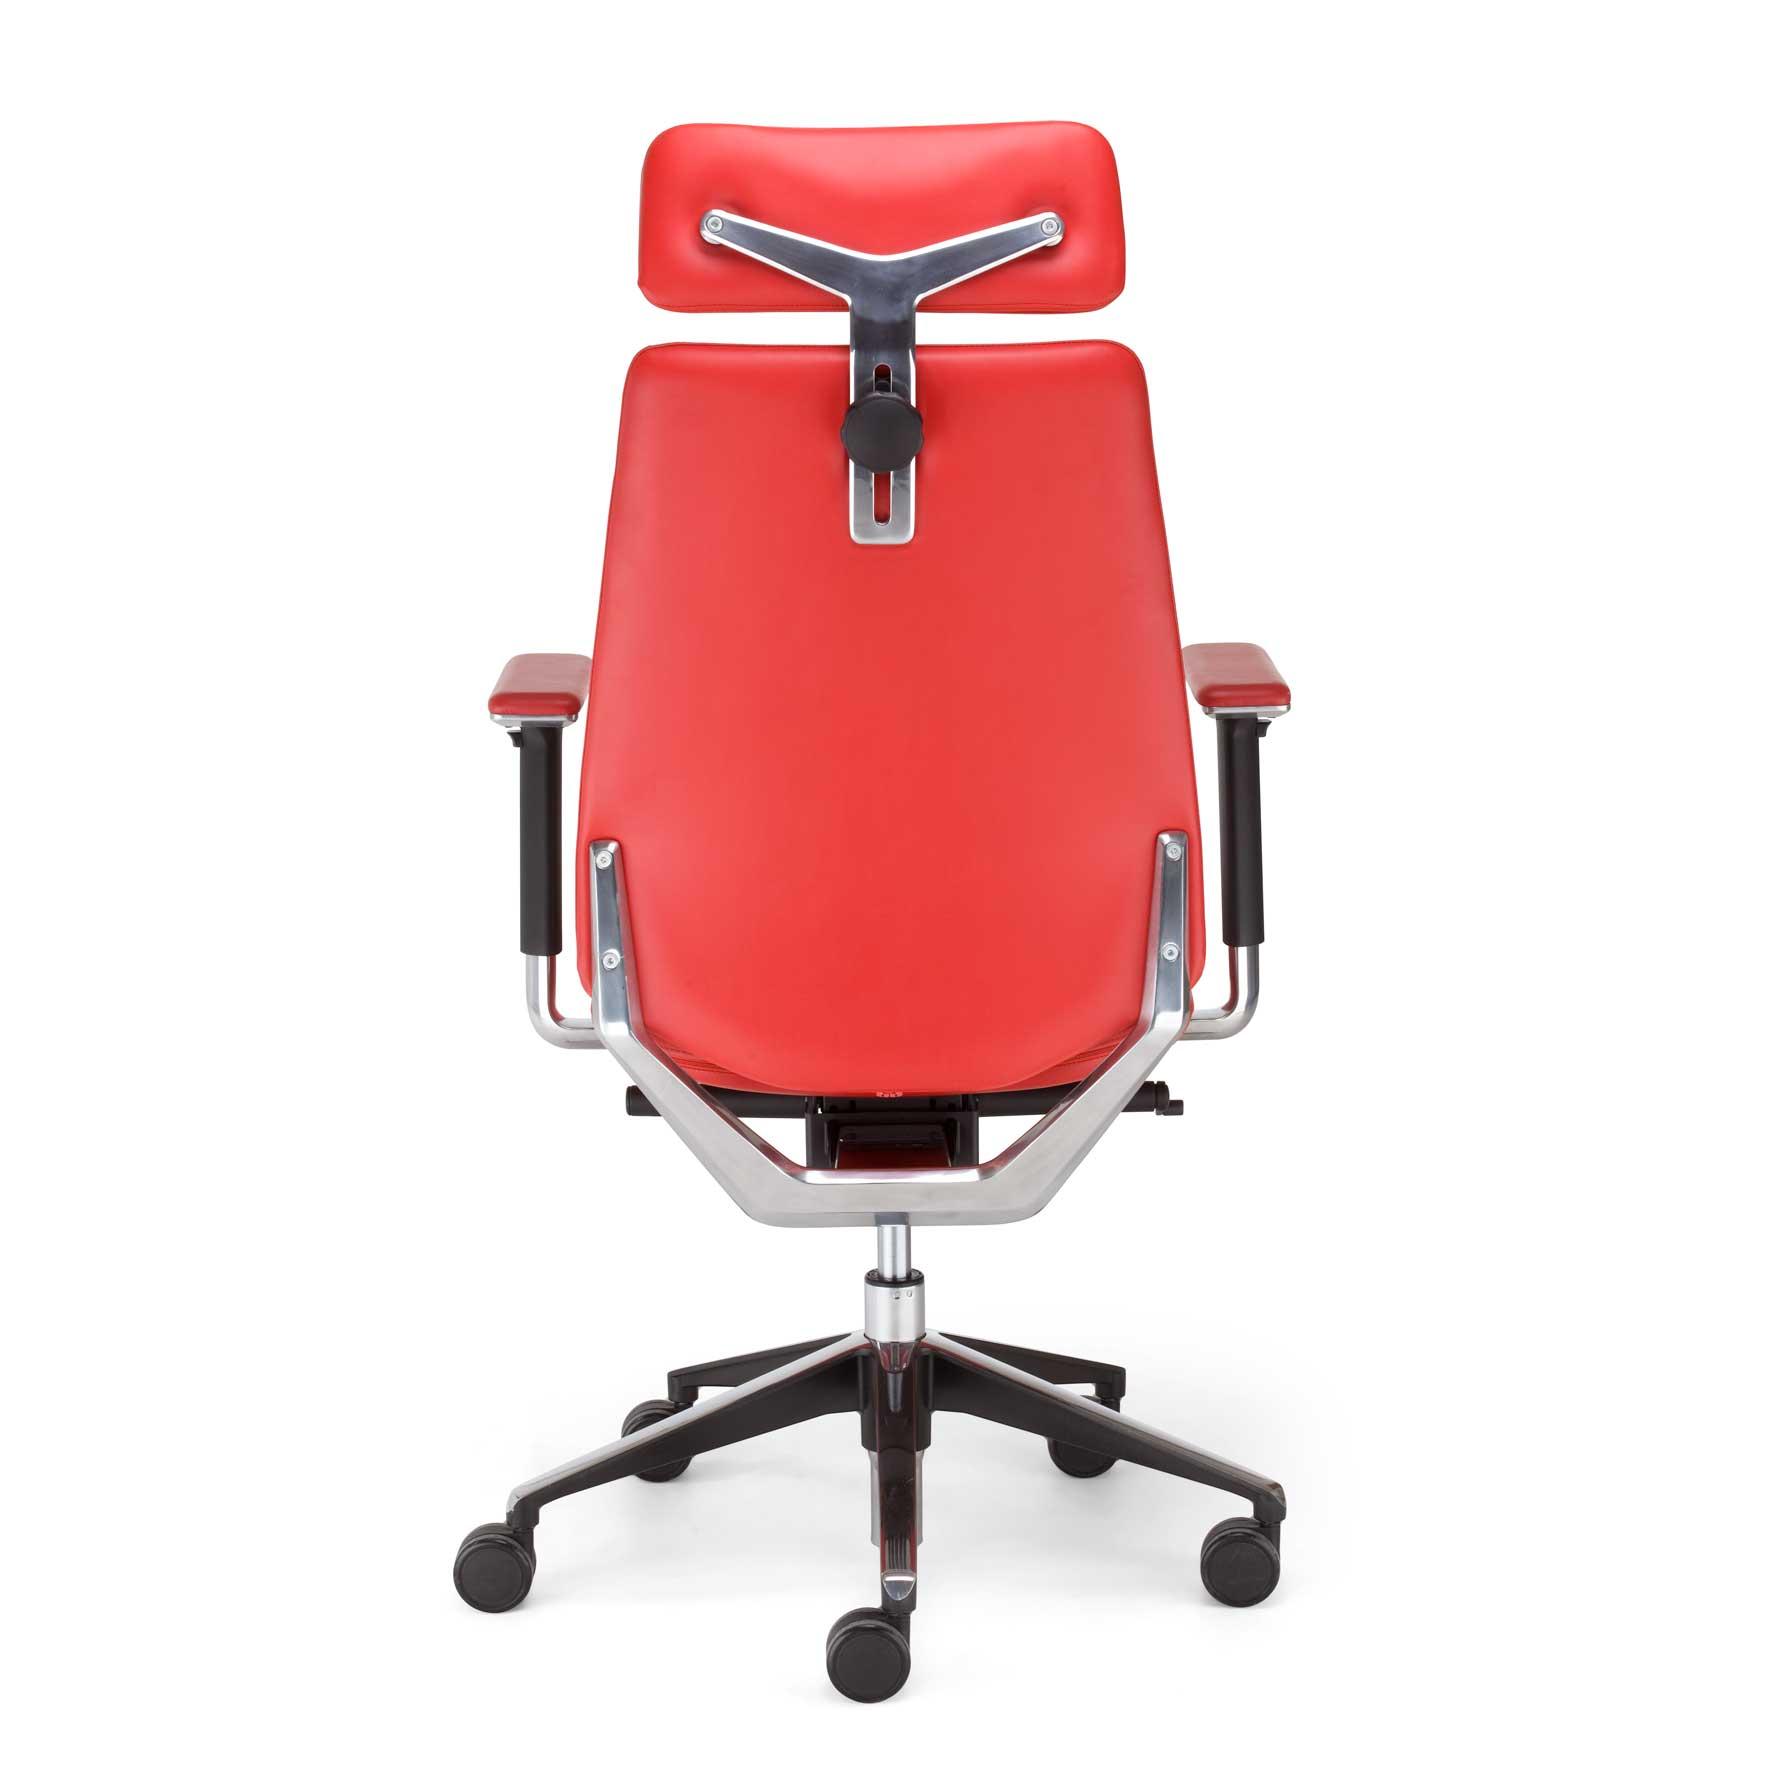 http://sedni.bg/clients/168/images/catalog/products/d1ed7fa0660b94f5_Next_U_HR_R23P1_steel29_chrome_EpronSyncron_Plus_seat_slidingLE05_tyl.jpg